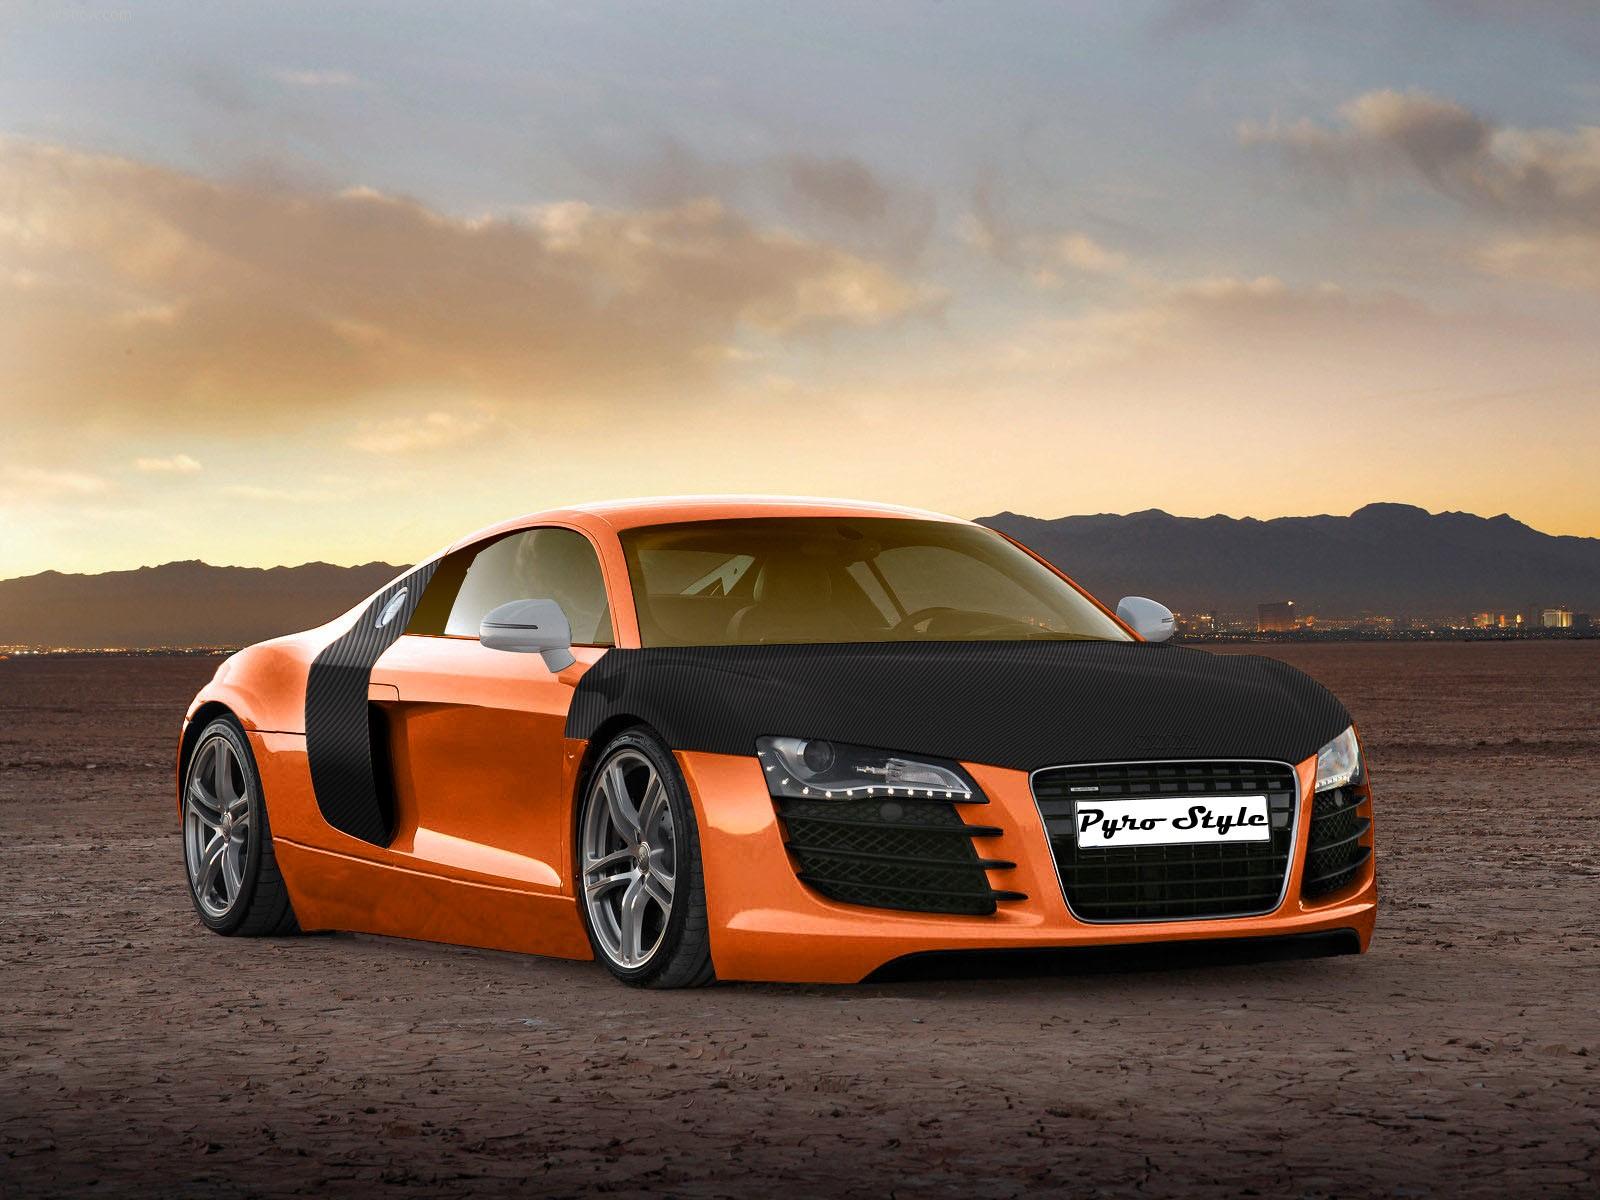 Latest Audi R8 GT Wallpapers ImageBankbiz 1600x1200